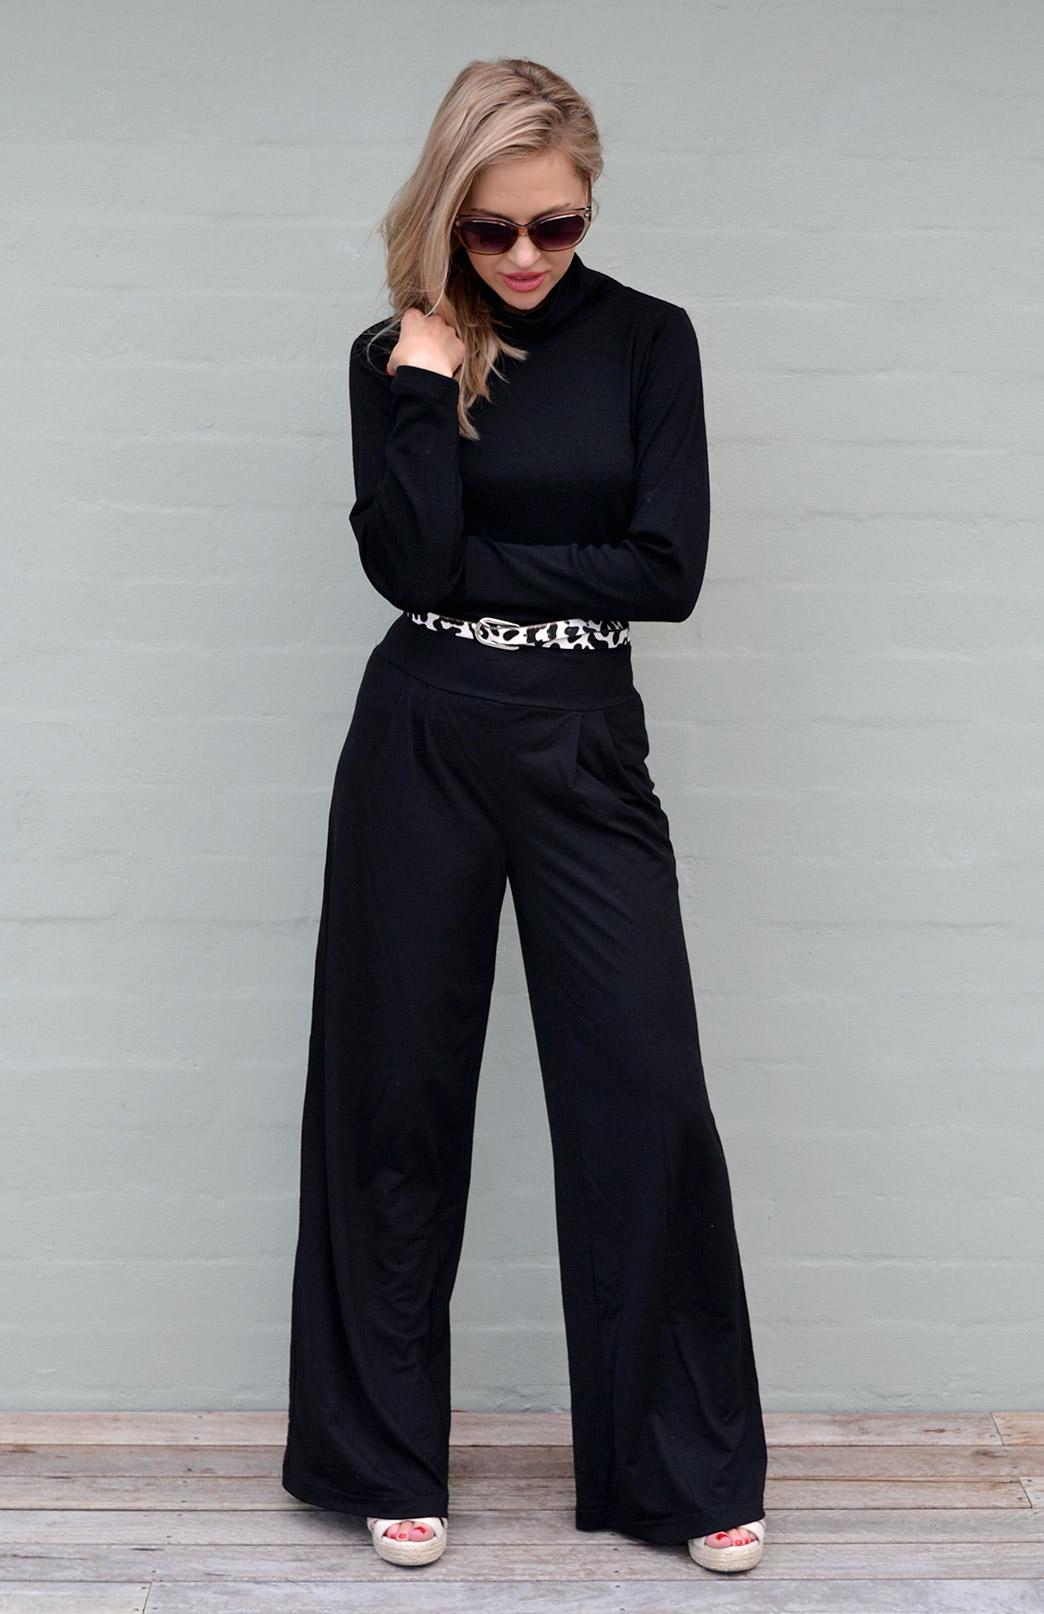 8541-palazzo-pants-black-5.jpg